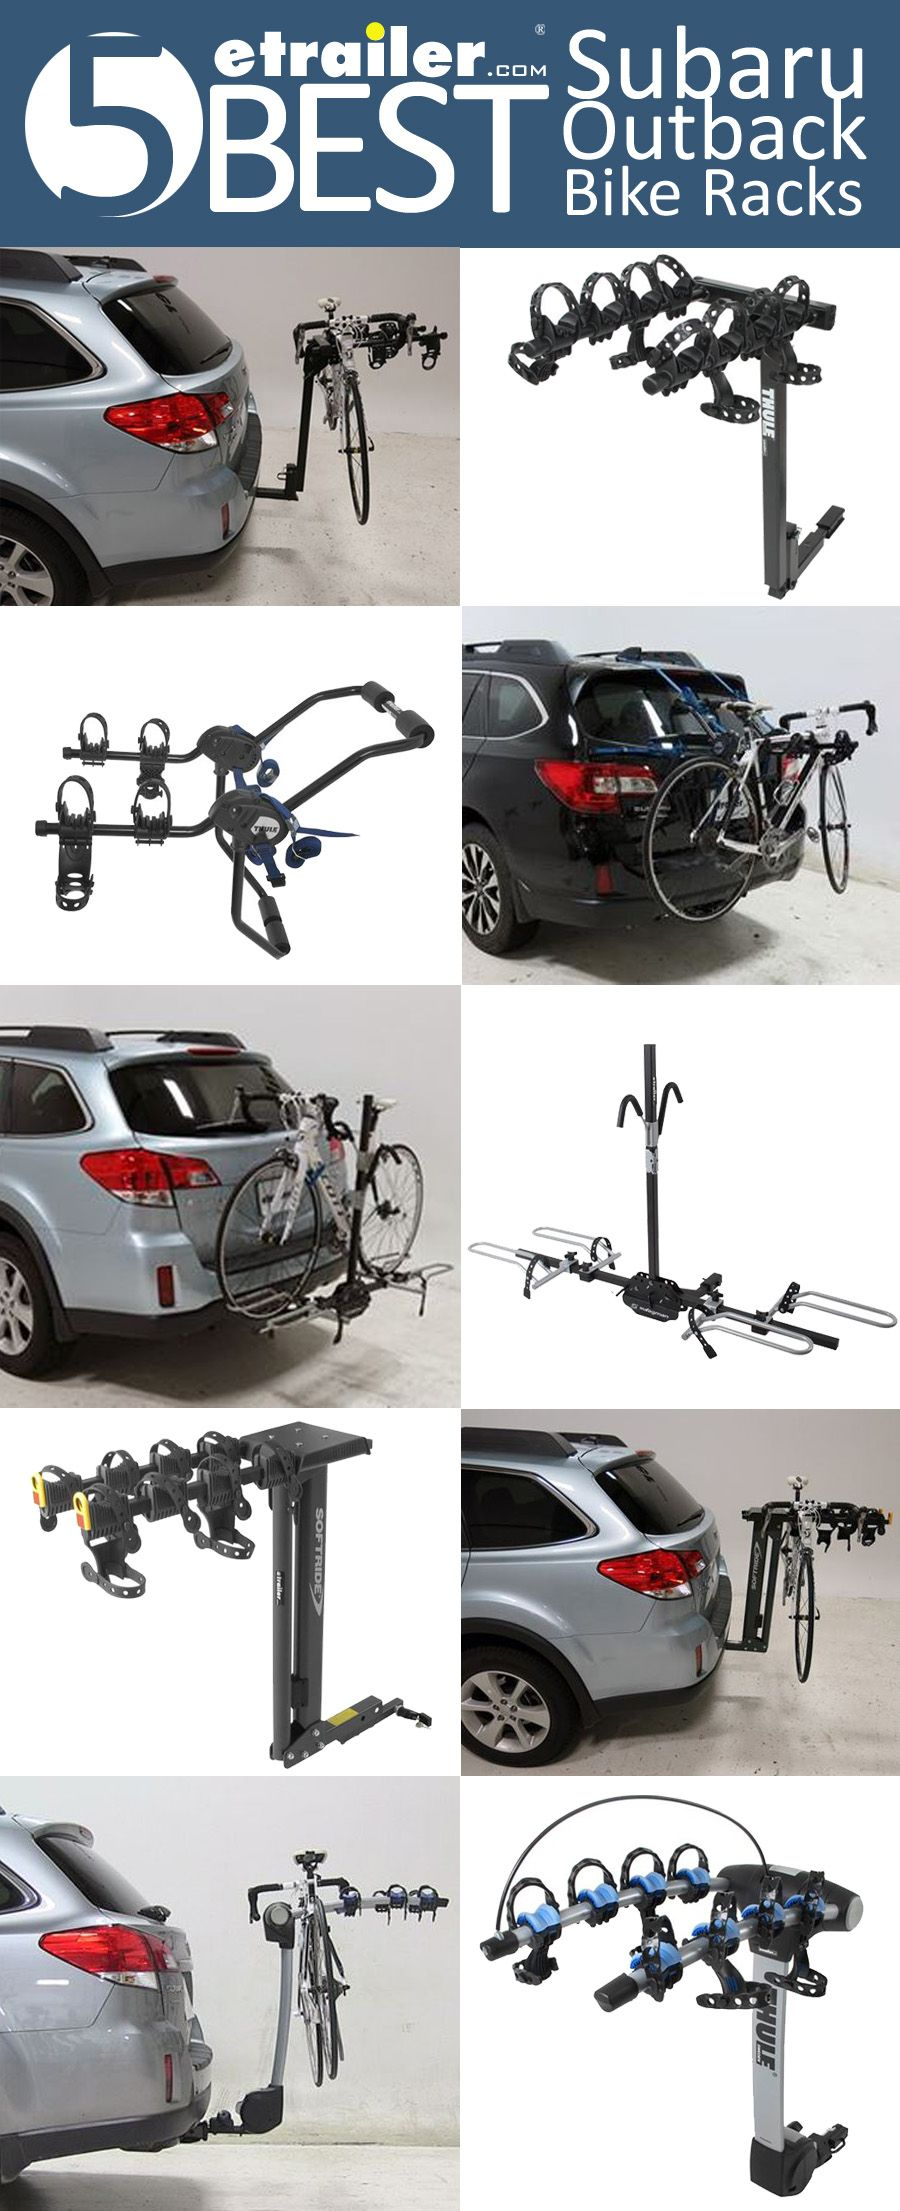 5 Best Subaru Outback Wagon Bike Racks Hitch And Hatch Bike Racks